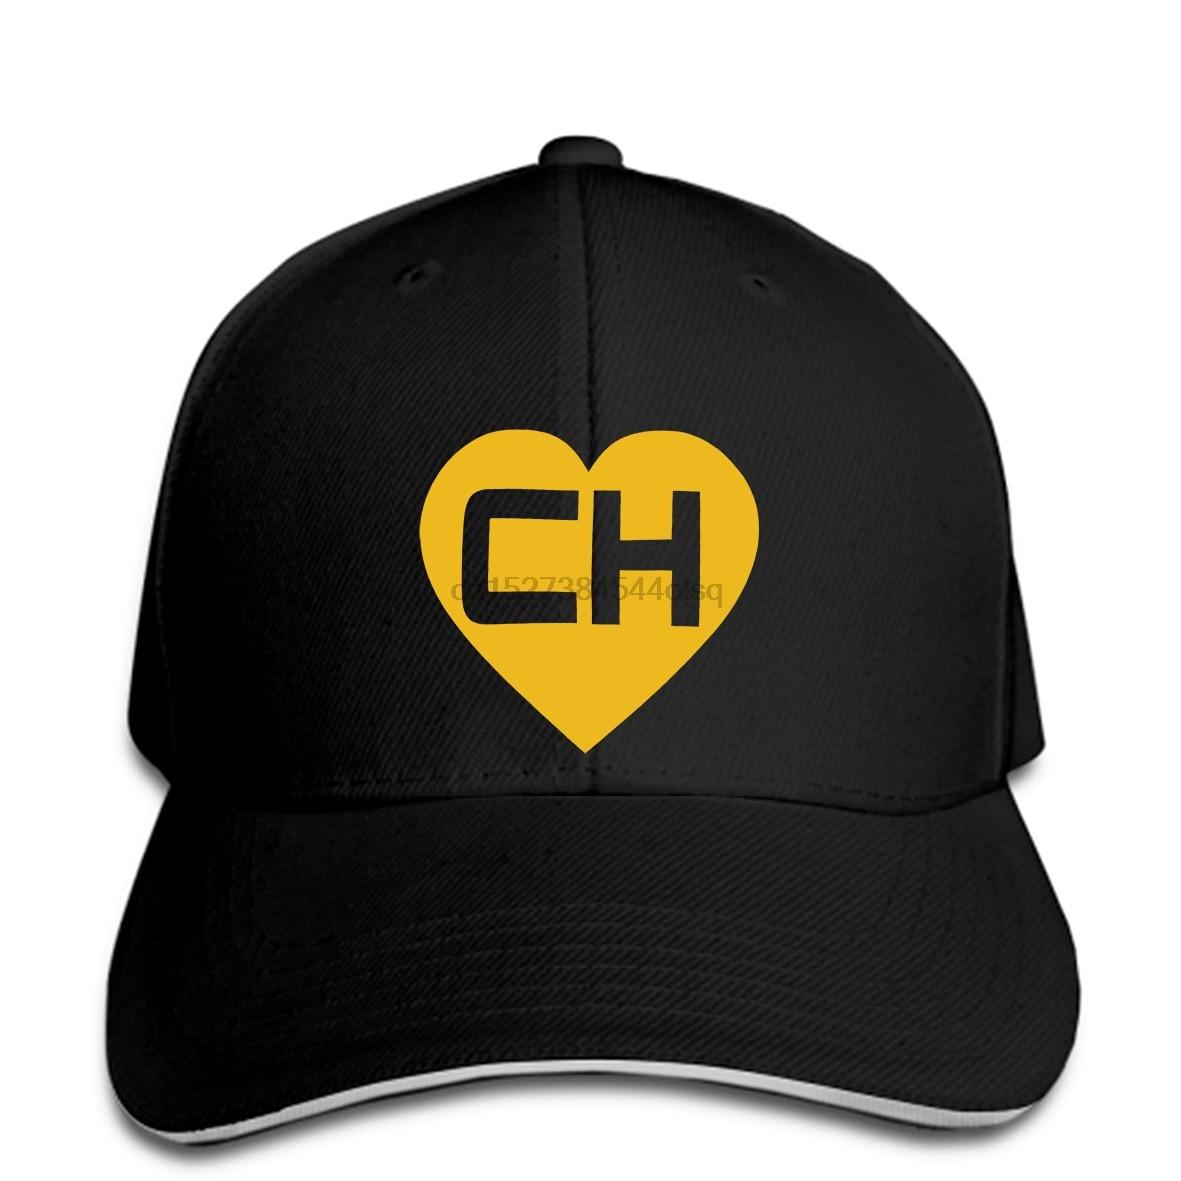 Orderly El Chavo Del 8 El Chapulin Colorado Mens Funny Mexican Convenient To Cook Men's Baseball Caps